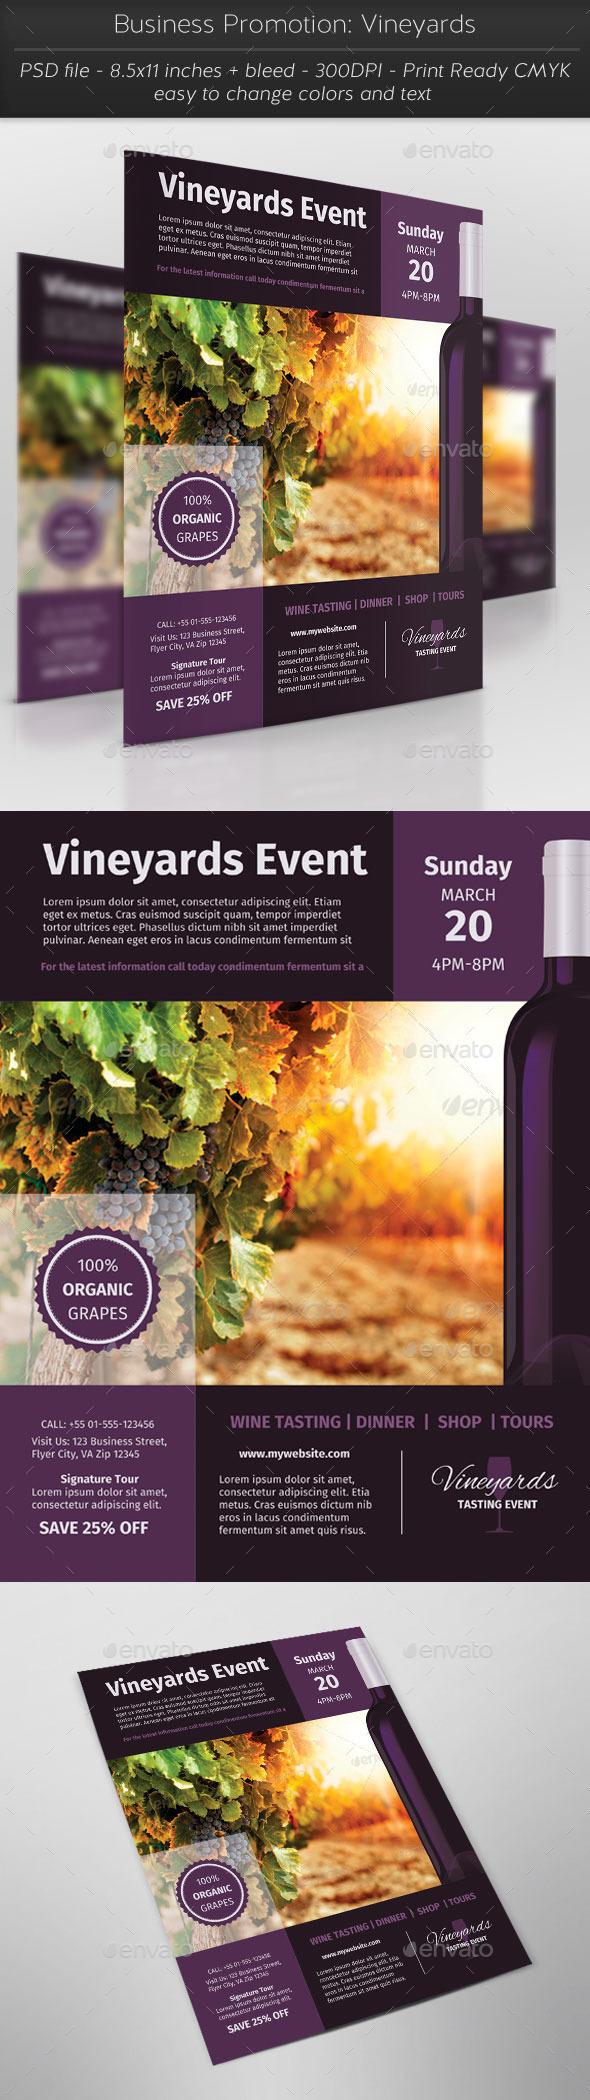 Business Promotion: Vineyards - Flyers Print Templates